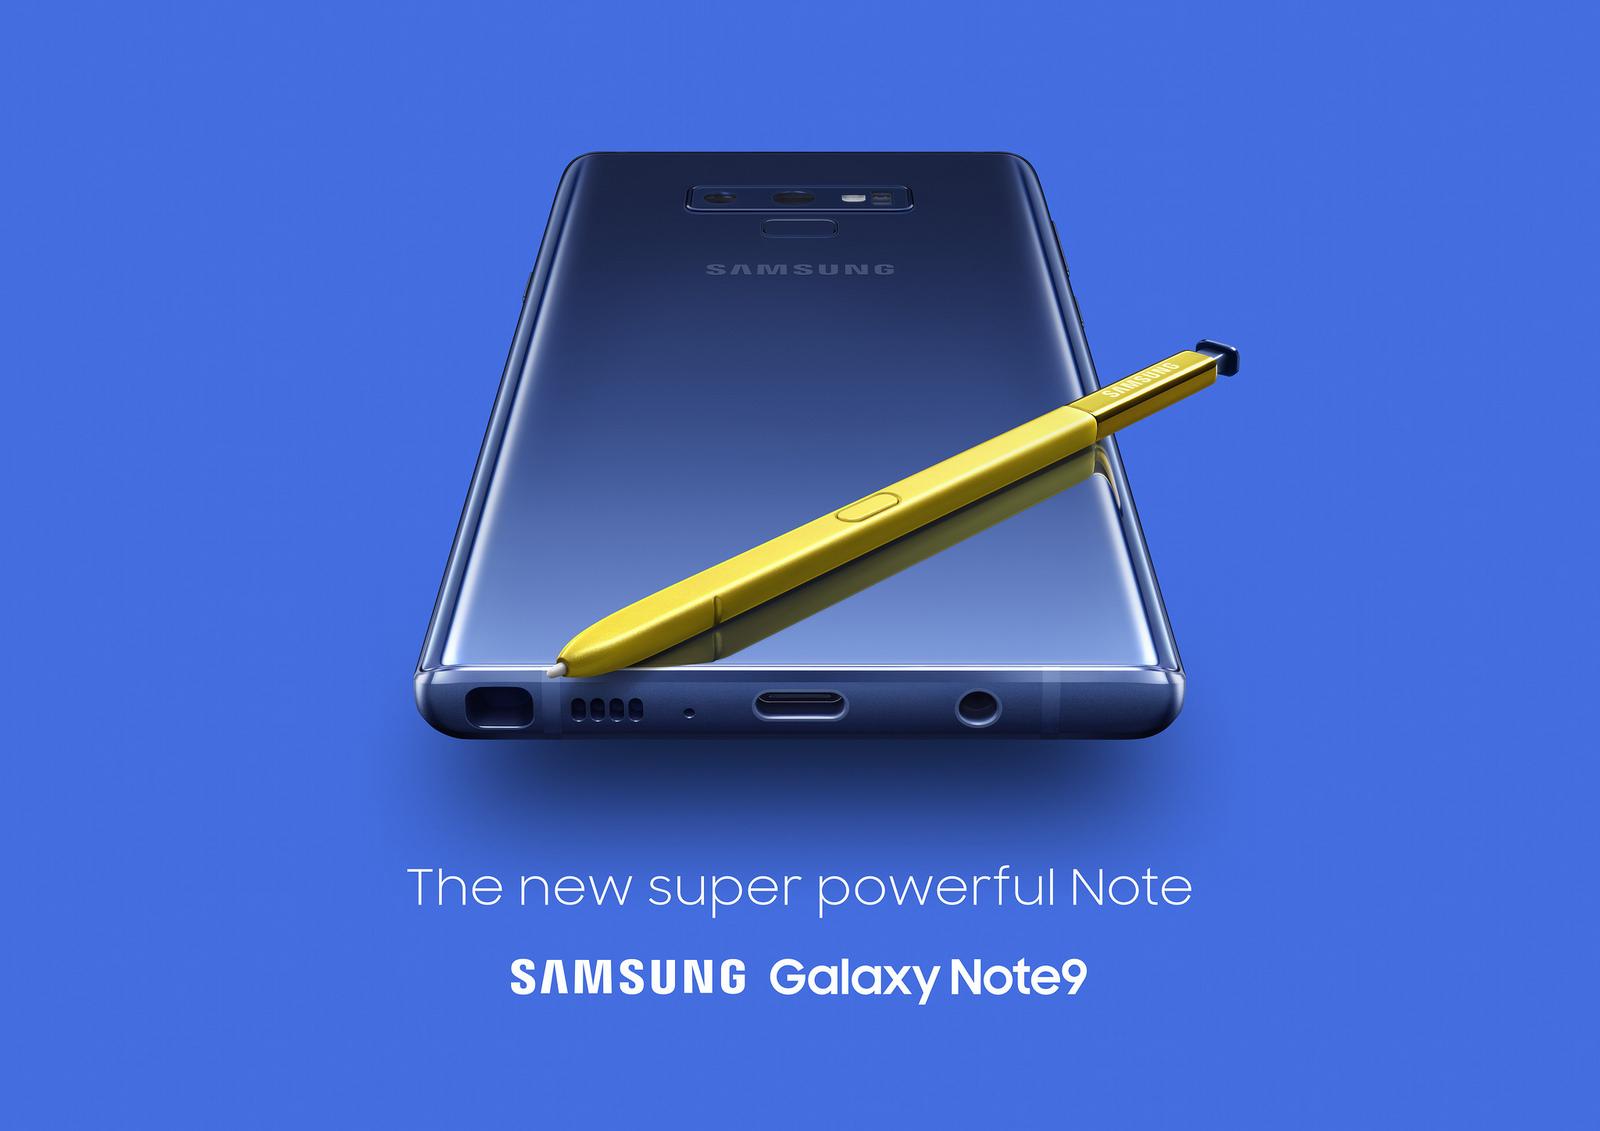 「Galaxy Note9」の新機能・スペック・価格・発売日・比較まとめ